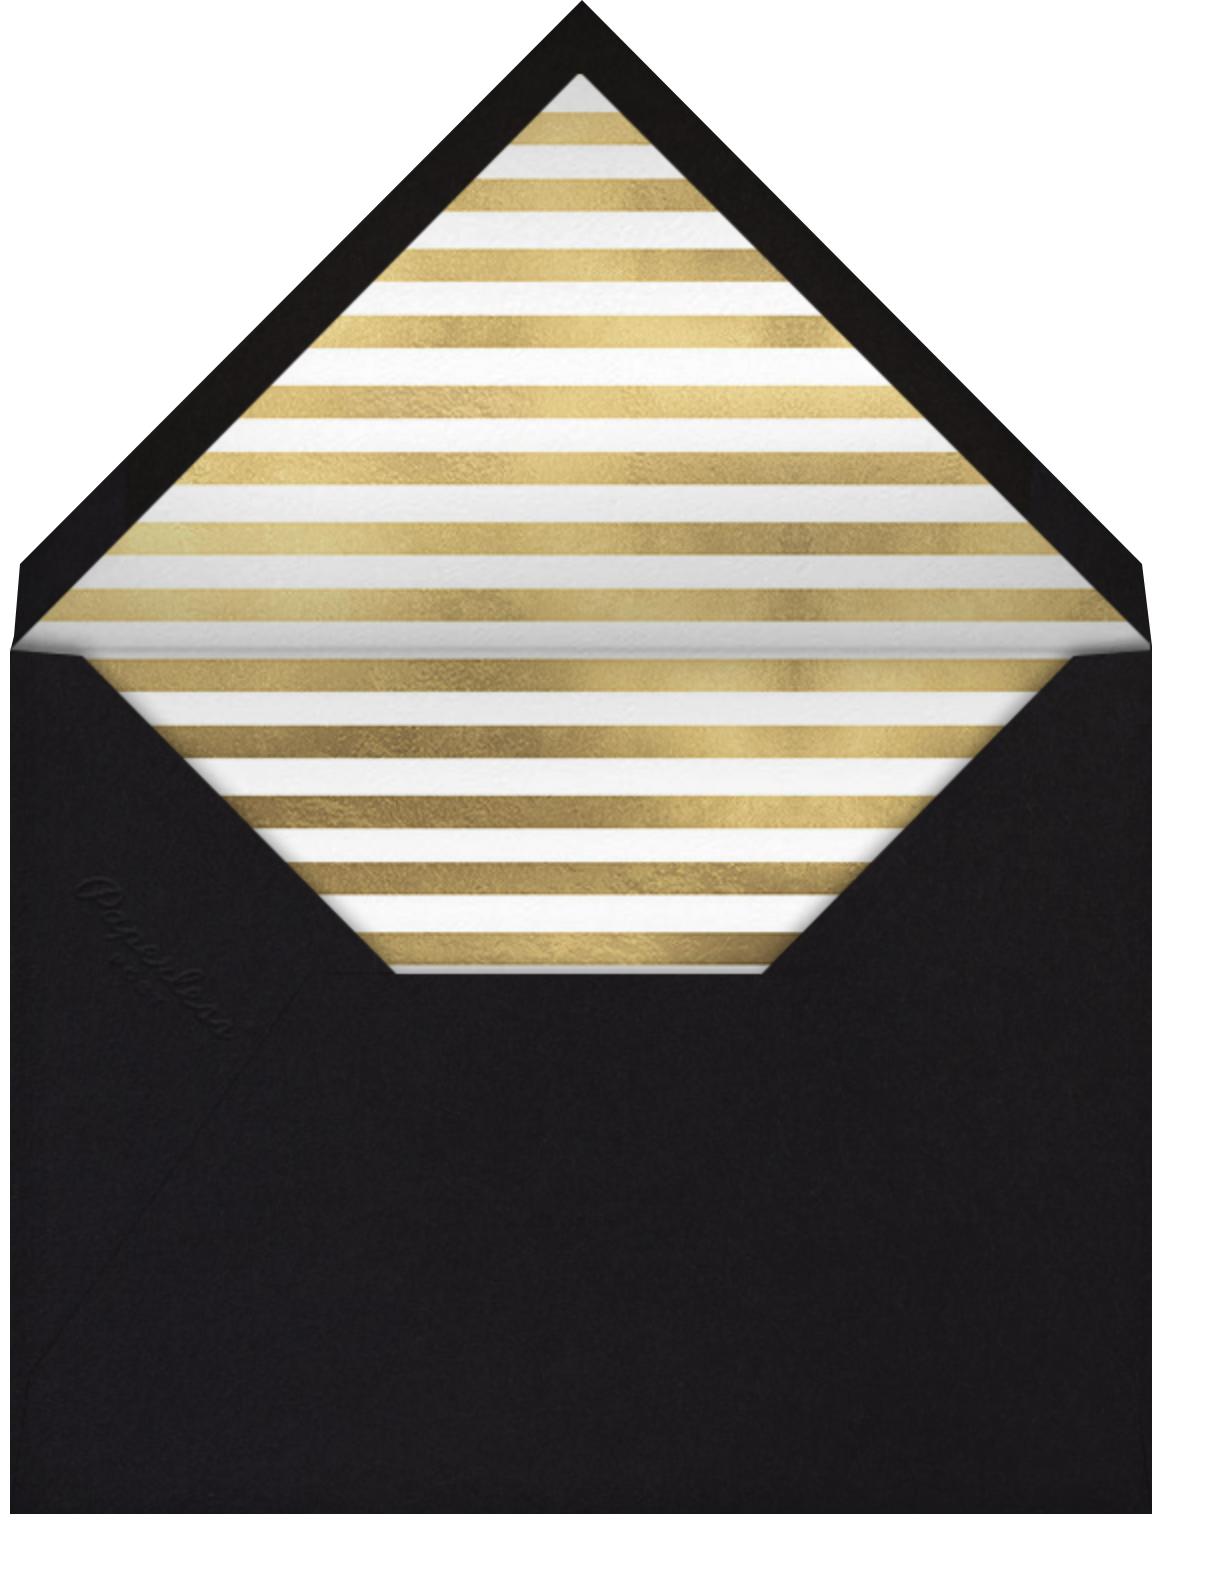 Orchid Shower (Square) - Black - kate spade new york - Adult birthday - envelope back